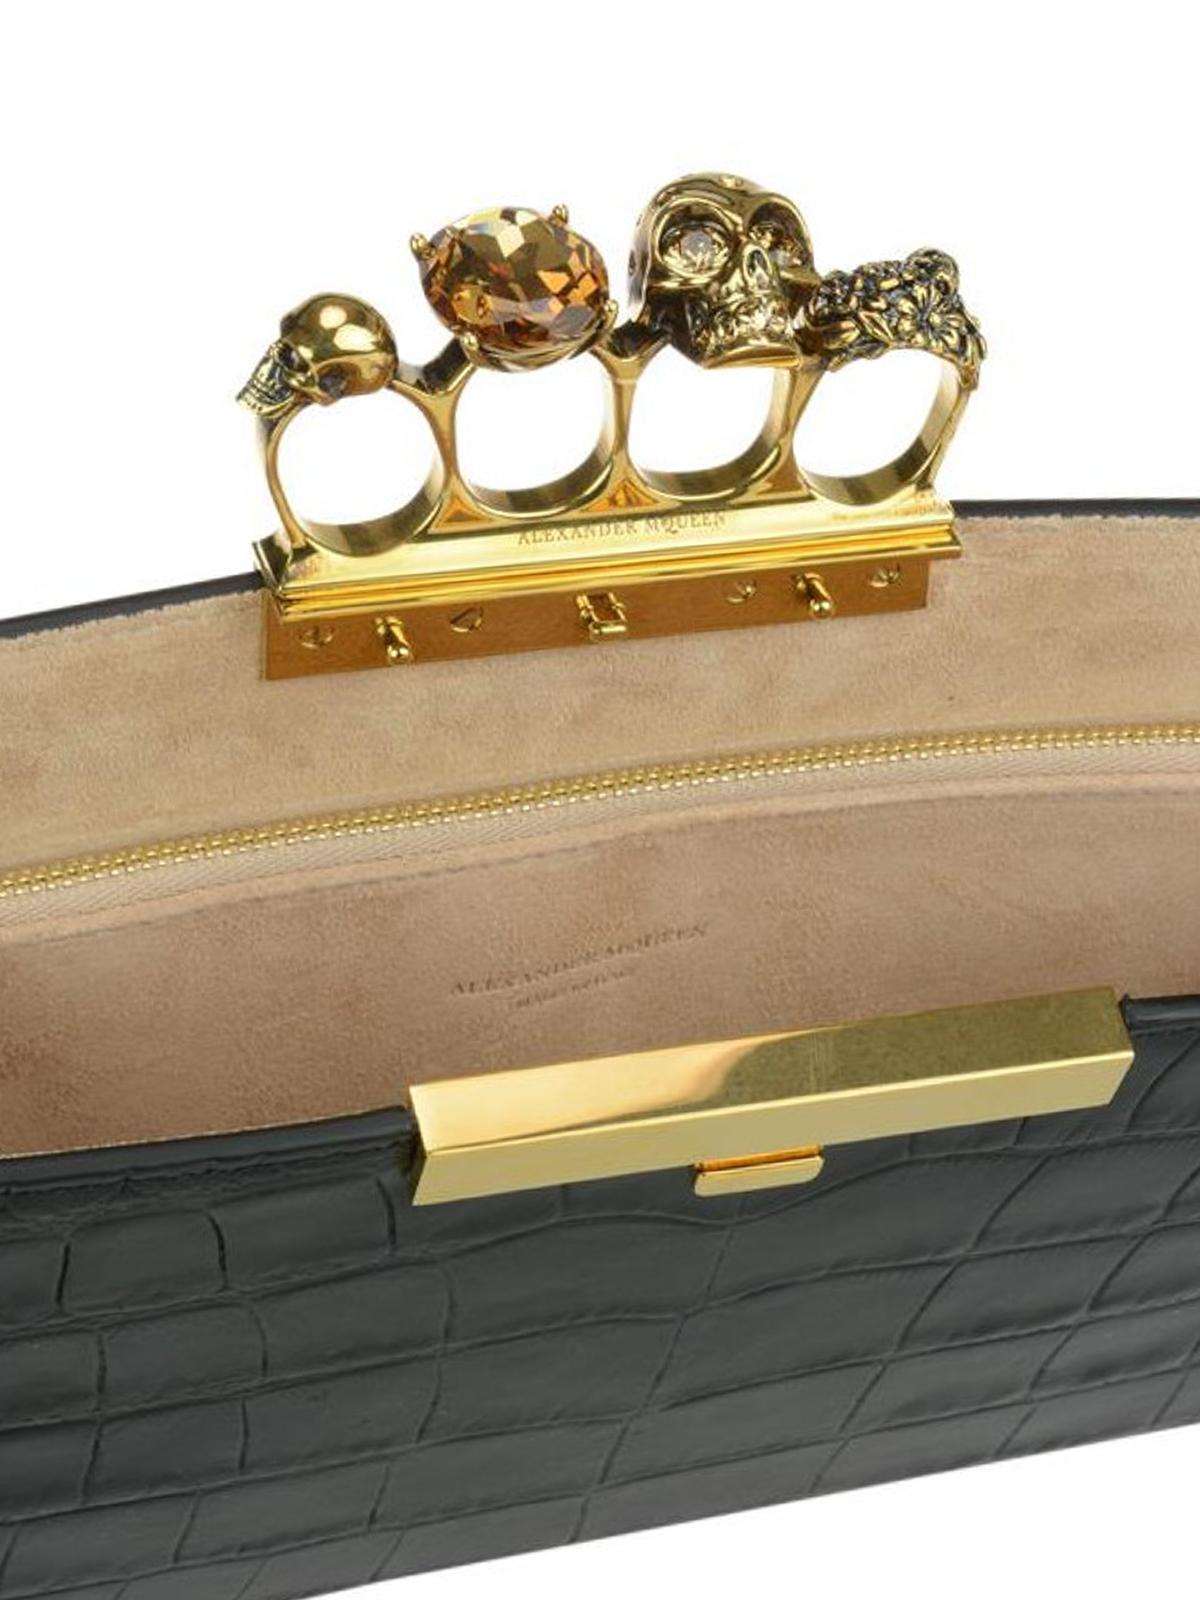 Alexander McQueen Four Ring clutch cJomHo7a